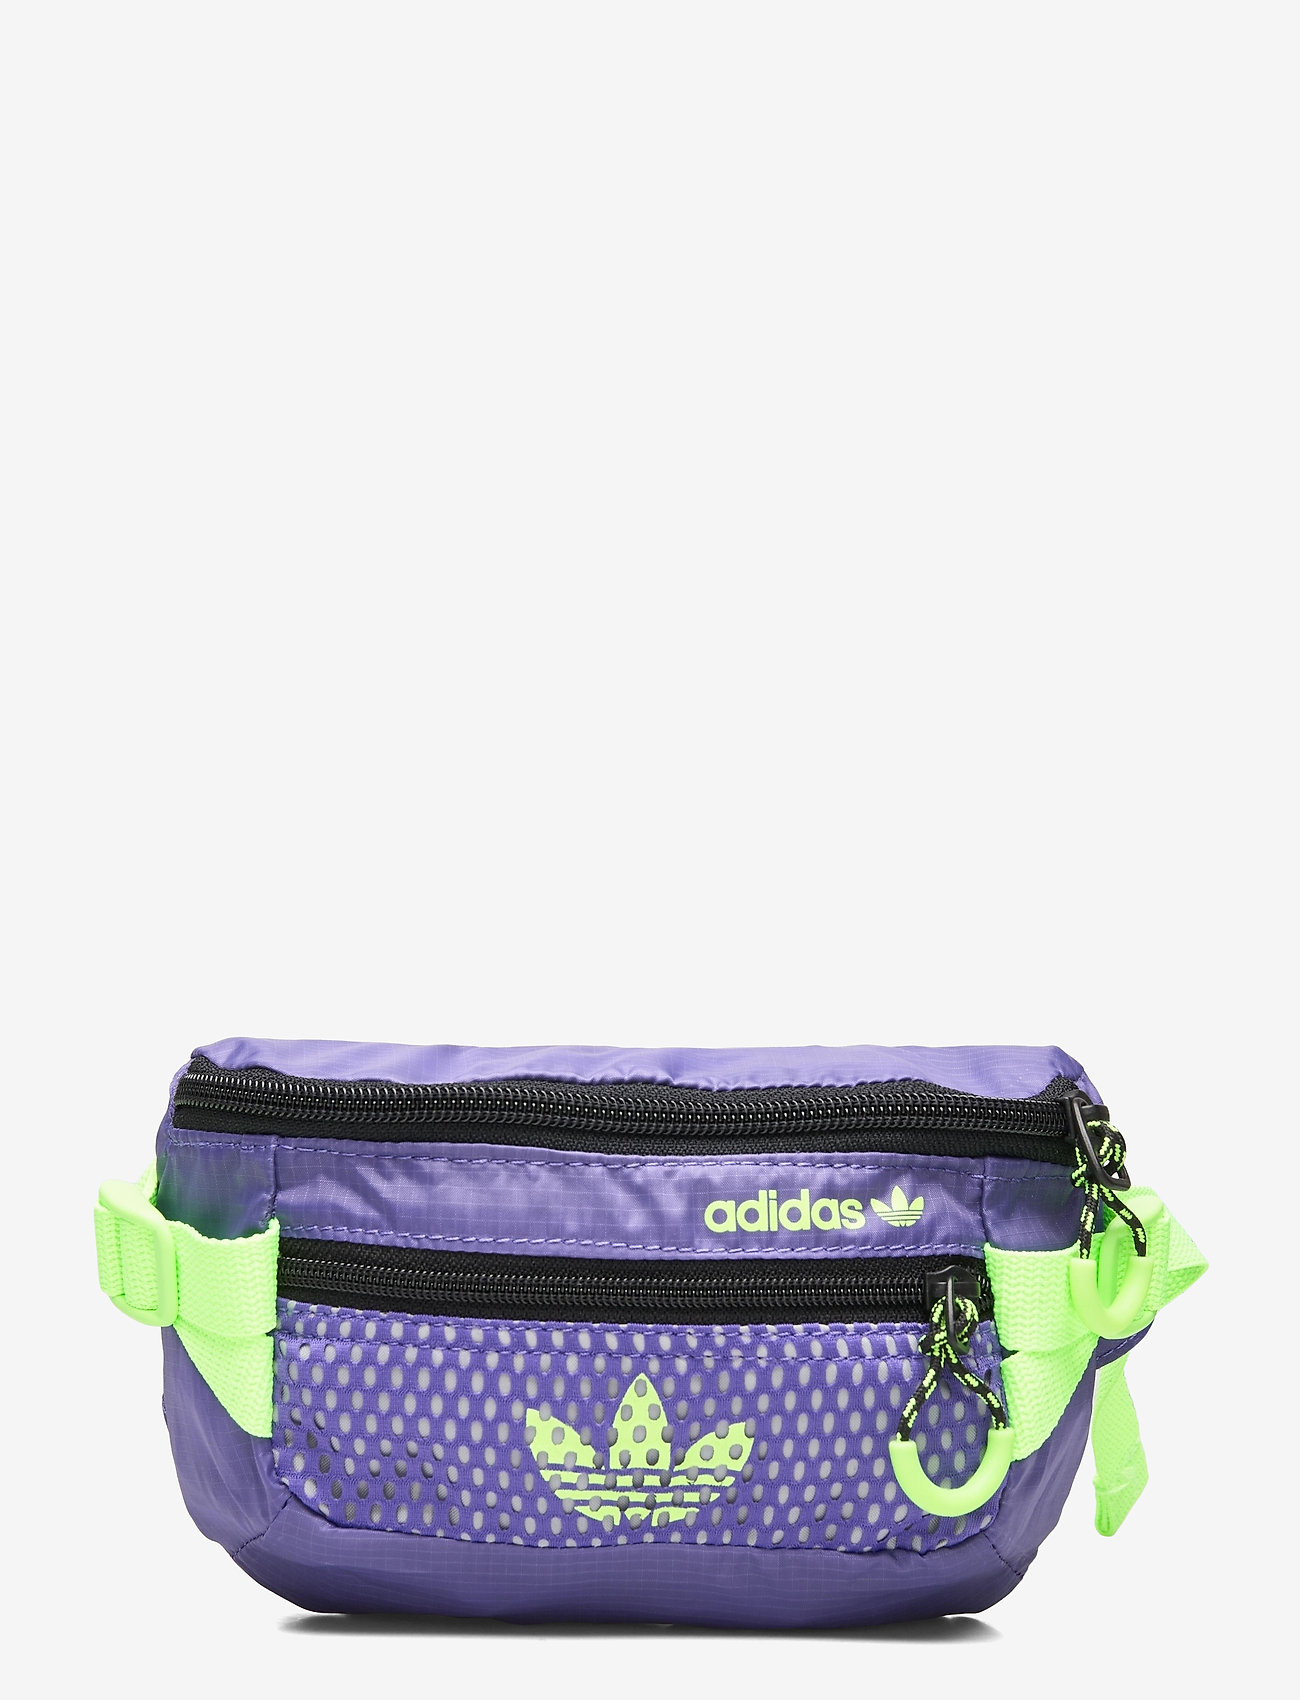 adidas Originals - ADV WAISTBAG S - midjeveske - purple/black/siggnr - 0